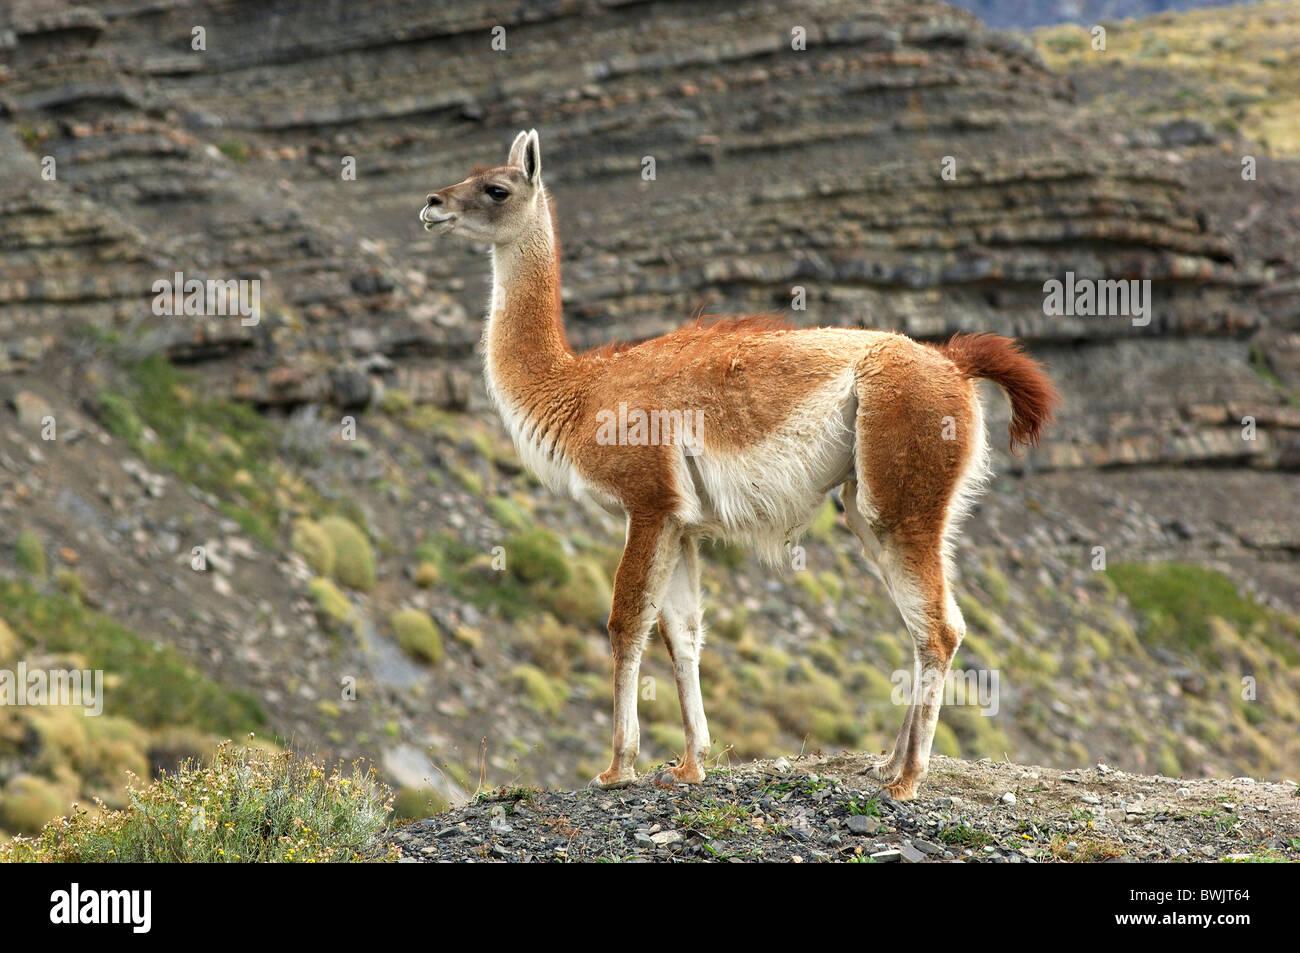 Guanako llama lama guanicoe Parque Nacional national park Torres del Paine Magallanes Patagonia Chile - Stock Image